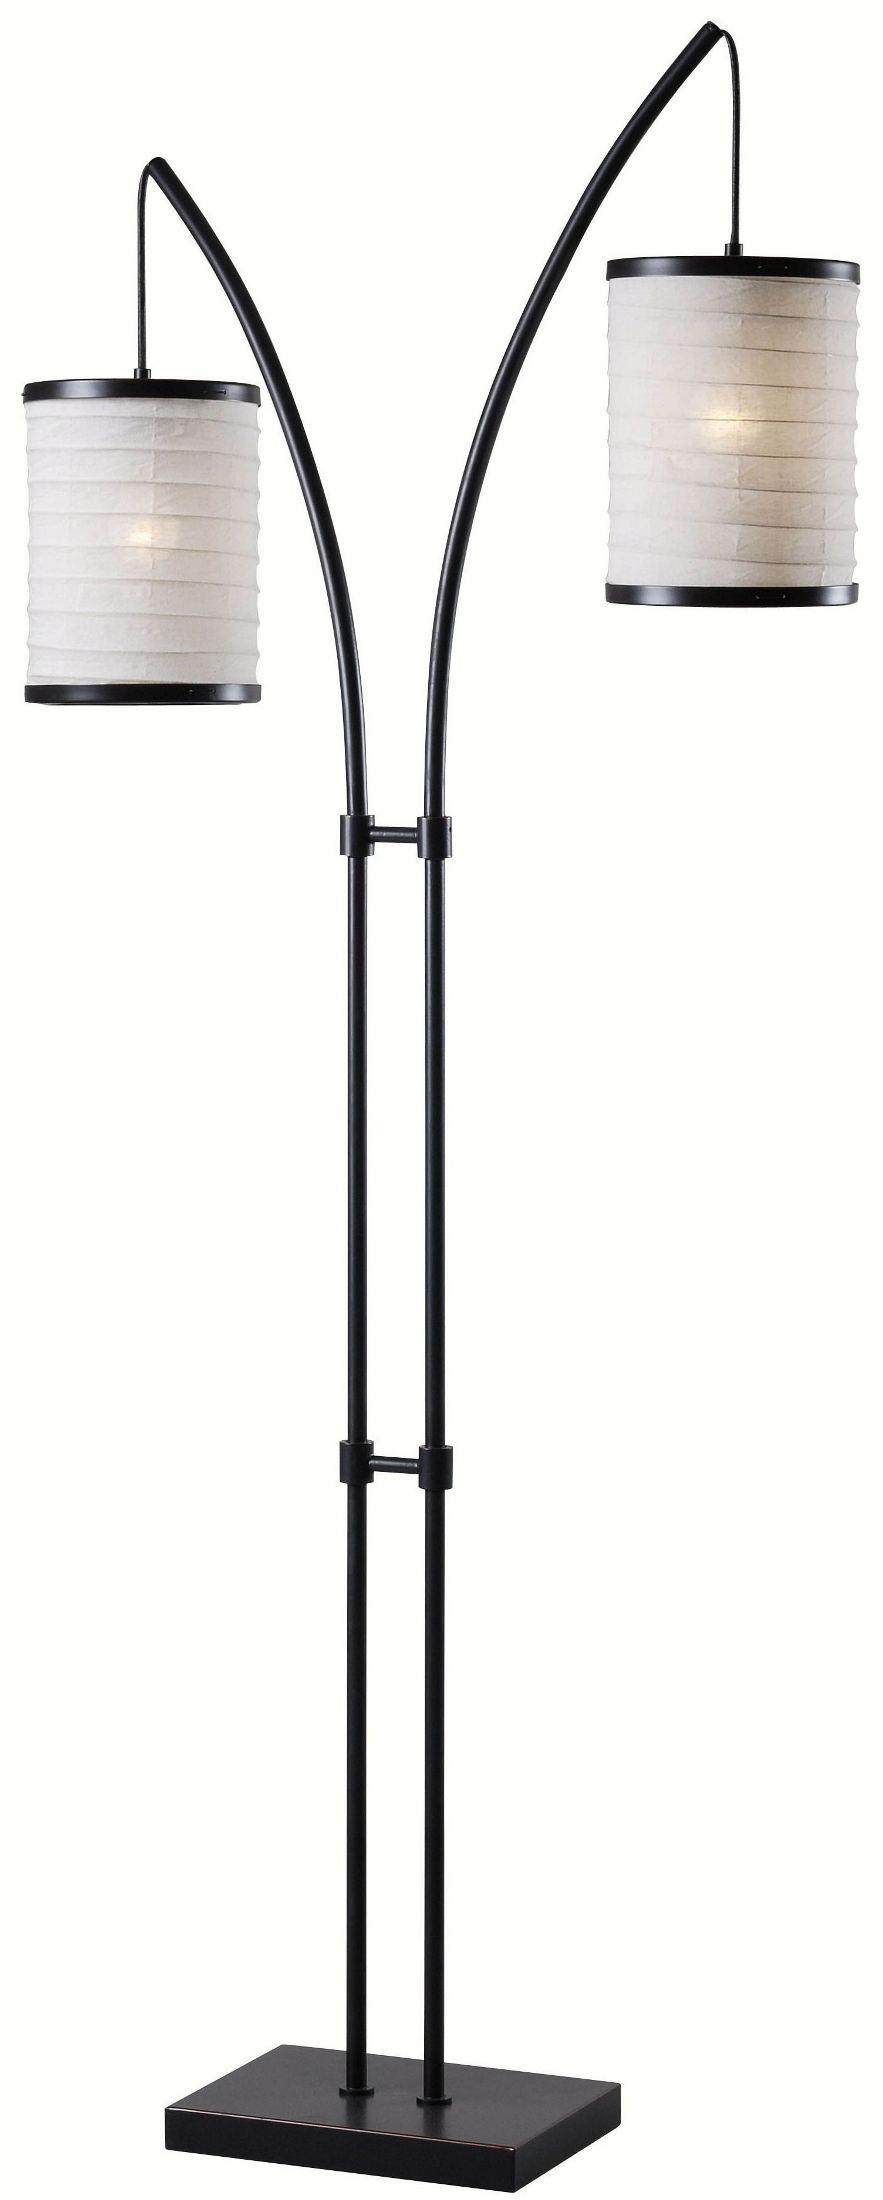 lanterna oil rubbed bronze floor lamp 32763orb kenroy home. Black Bedroom Furniture Sets. Home Design Ideas